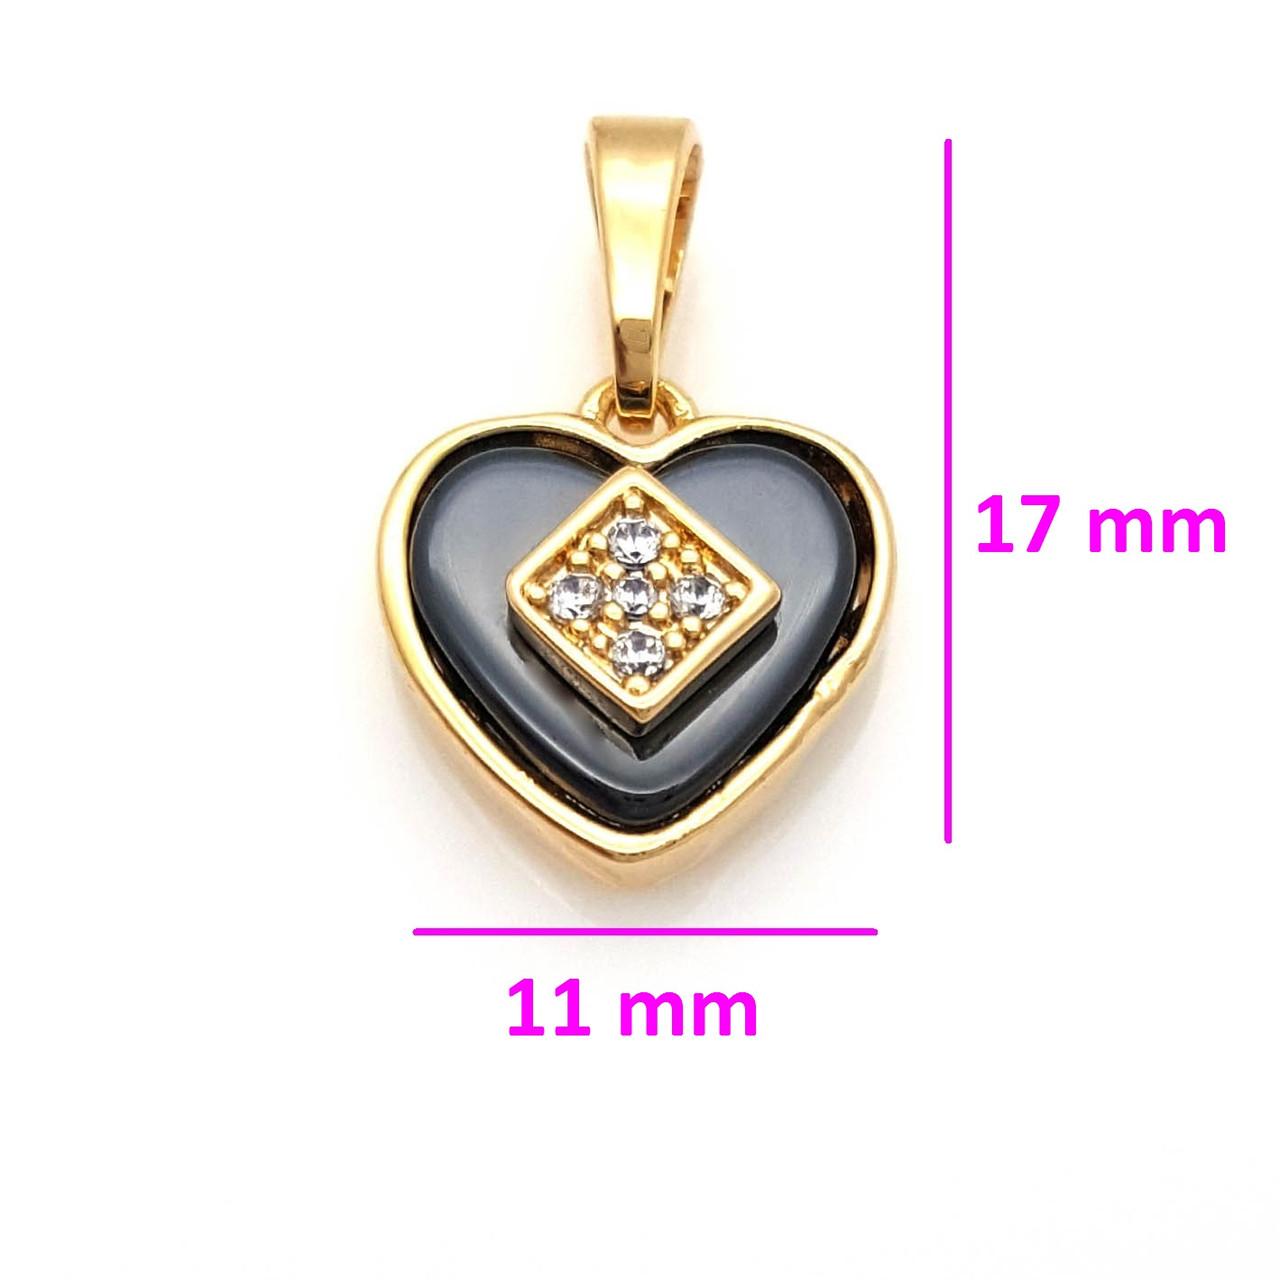 Кулон медзолото Сердце из черной керамики, вставка цирконий